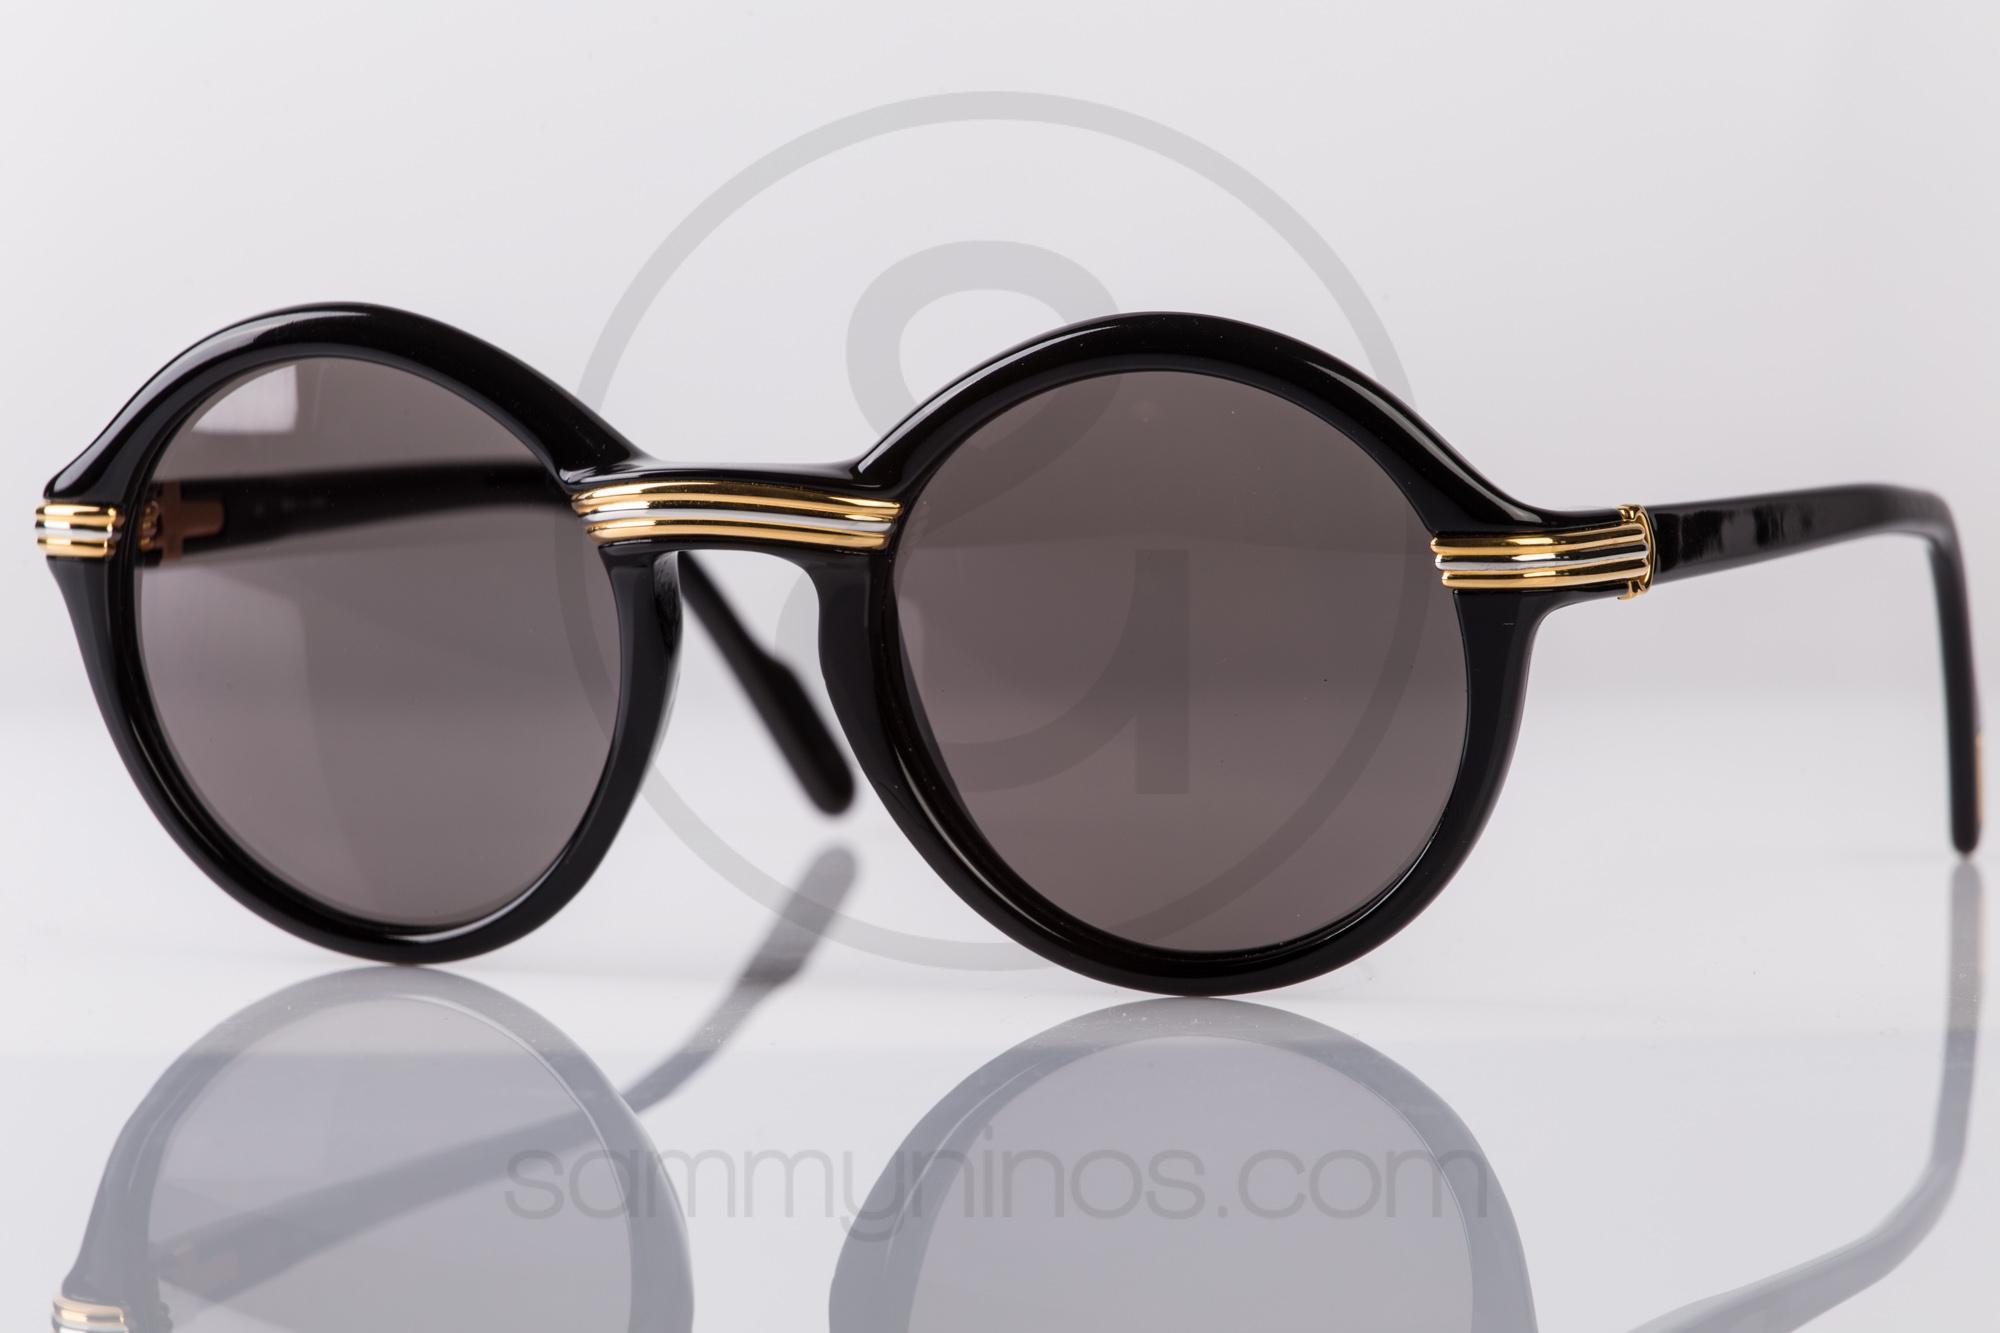 298c08860a7 Cartier Cabriolet Louis 52-22 – Sammy   Nino s Store